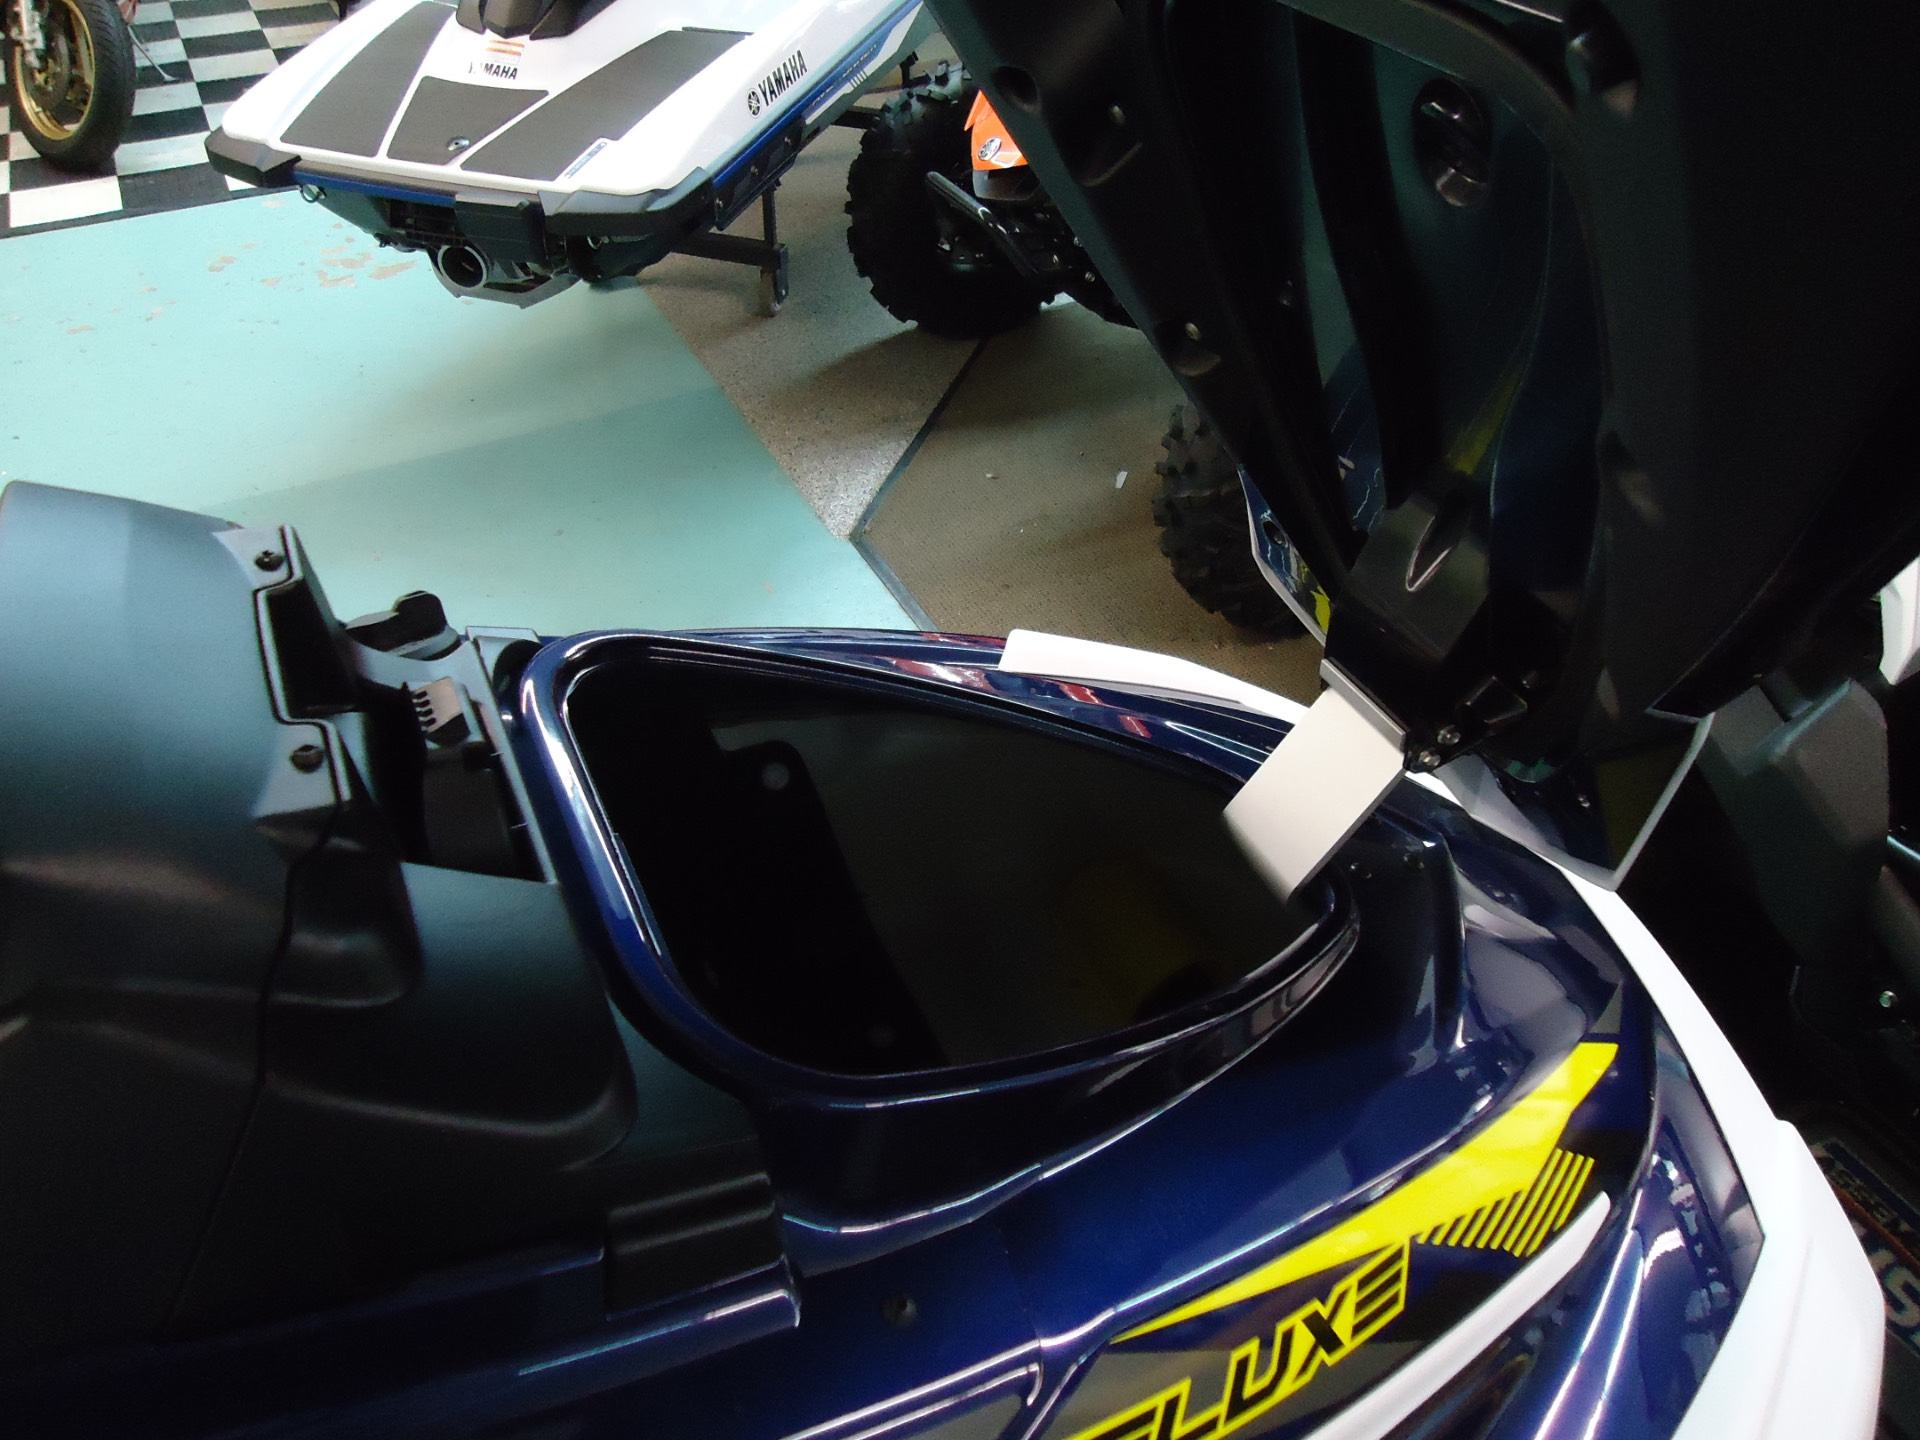 2017 Yamaha VX Deluxe 9